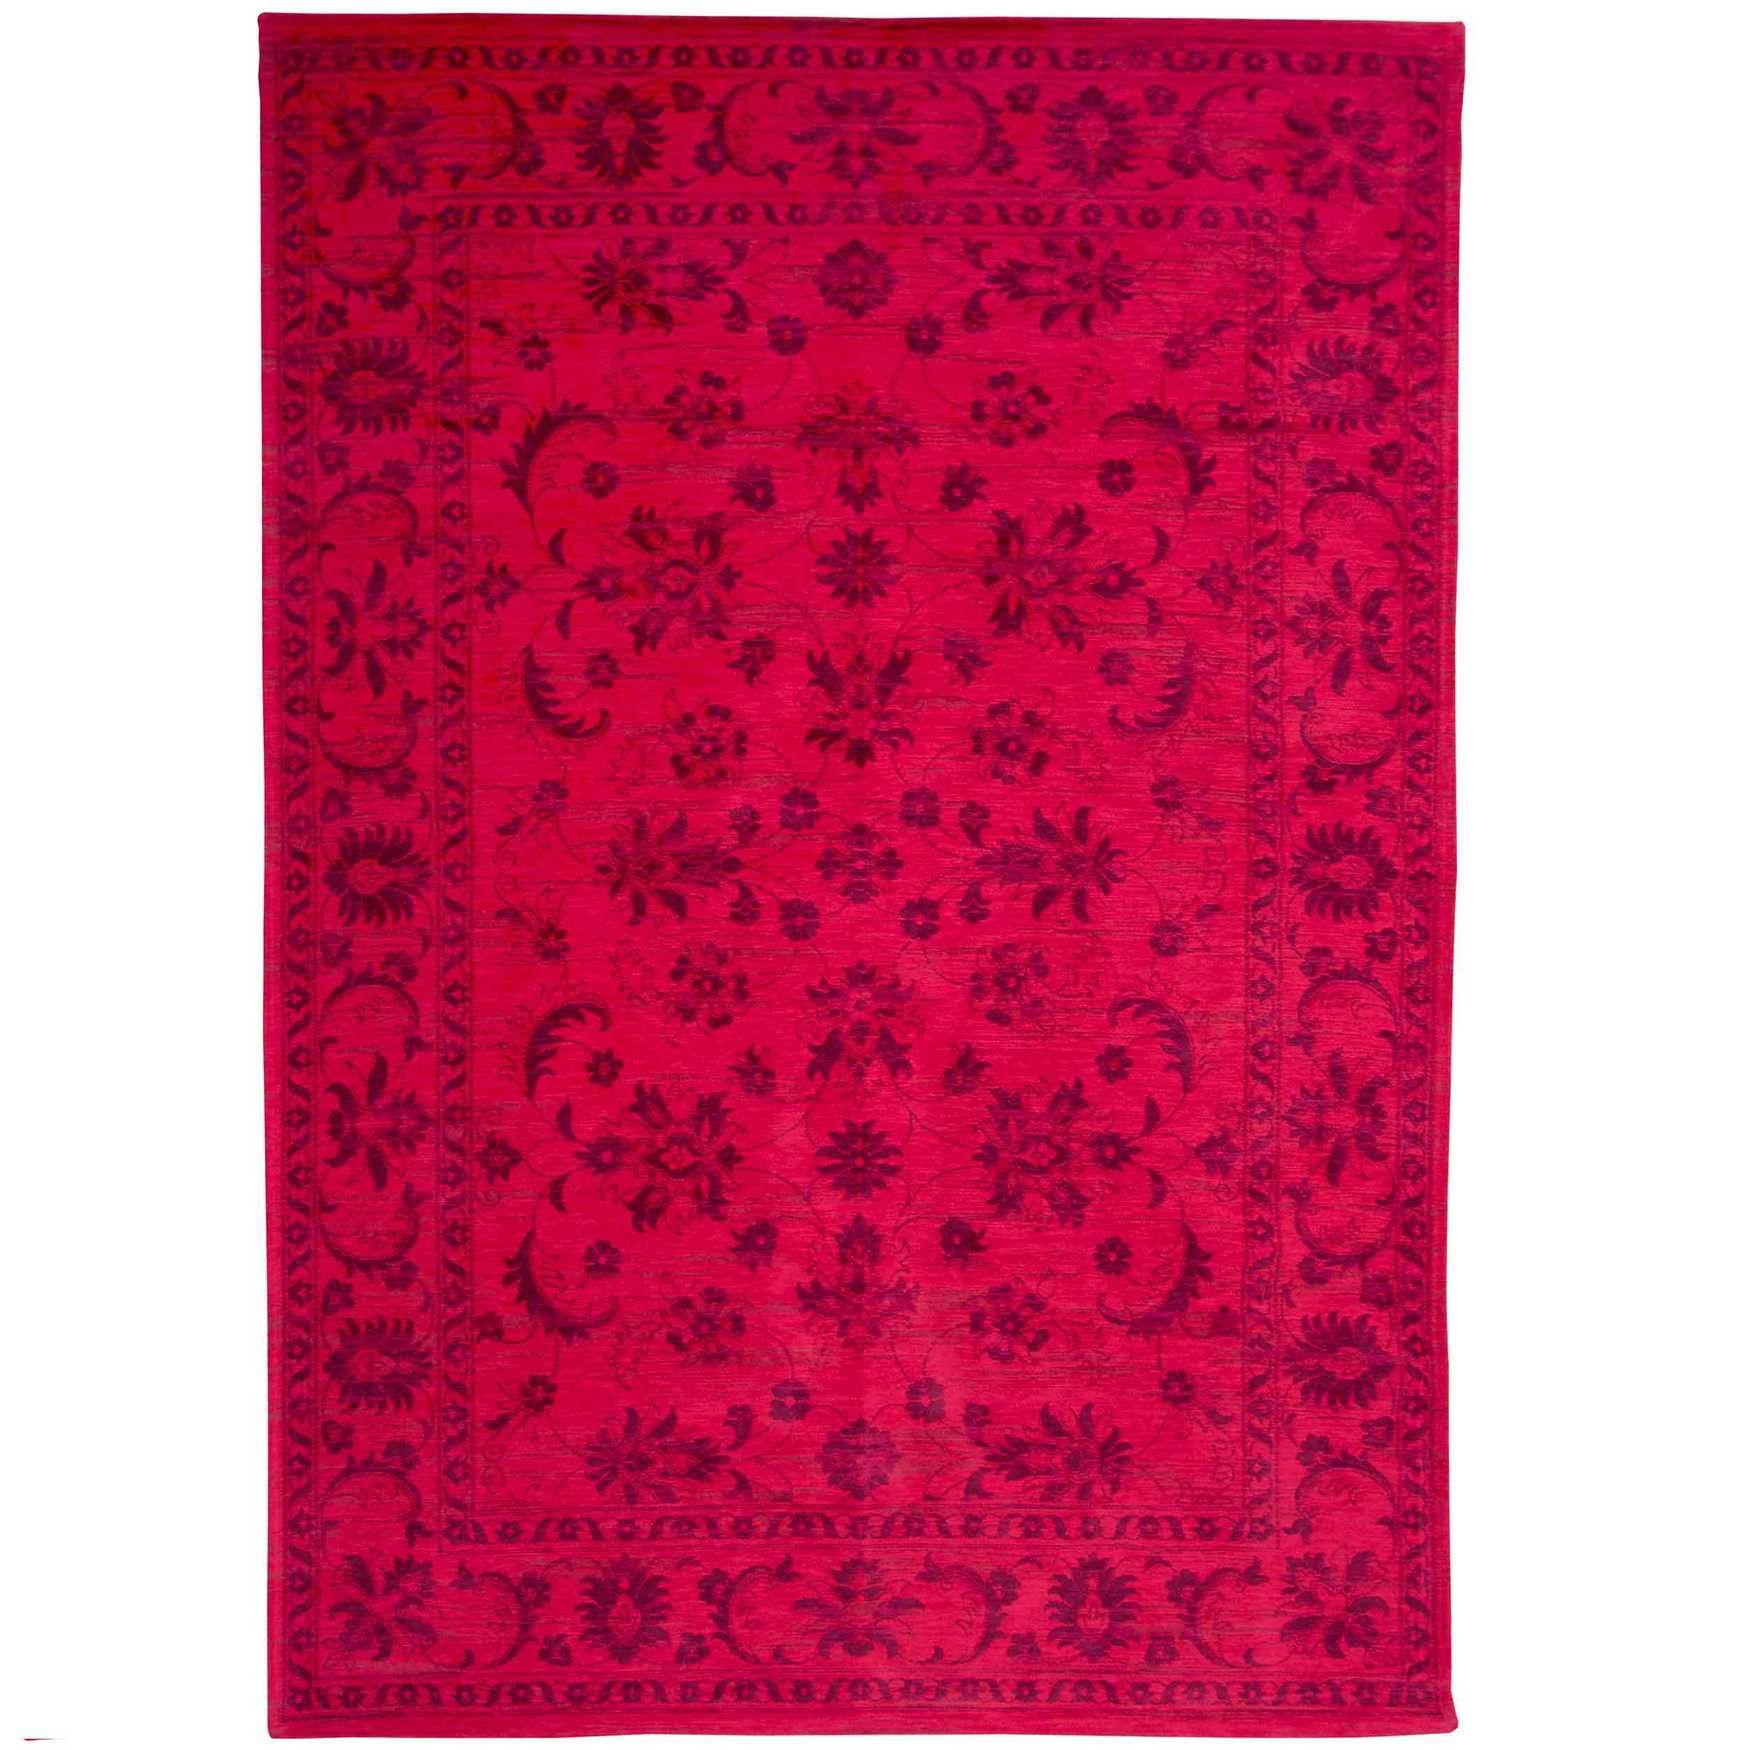 Keshan Cranberry 8034 Designer Luxury Rug Floral Rug Therugshopuk